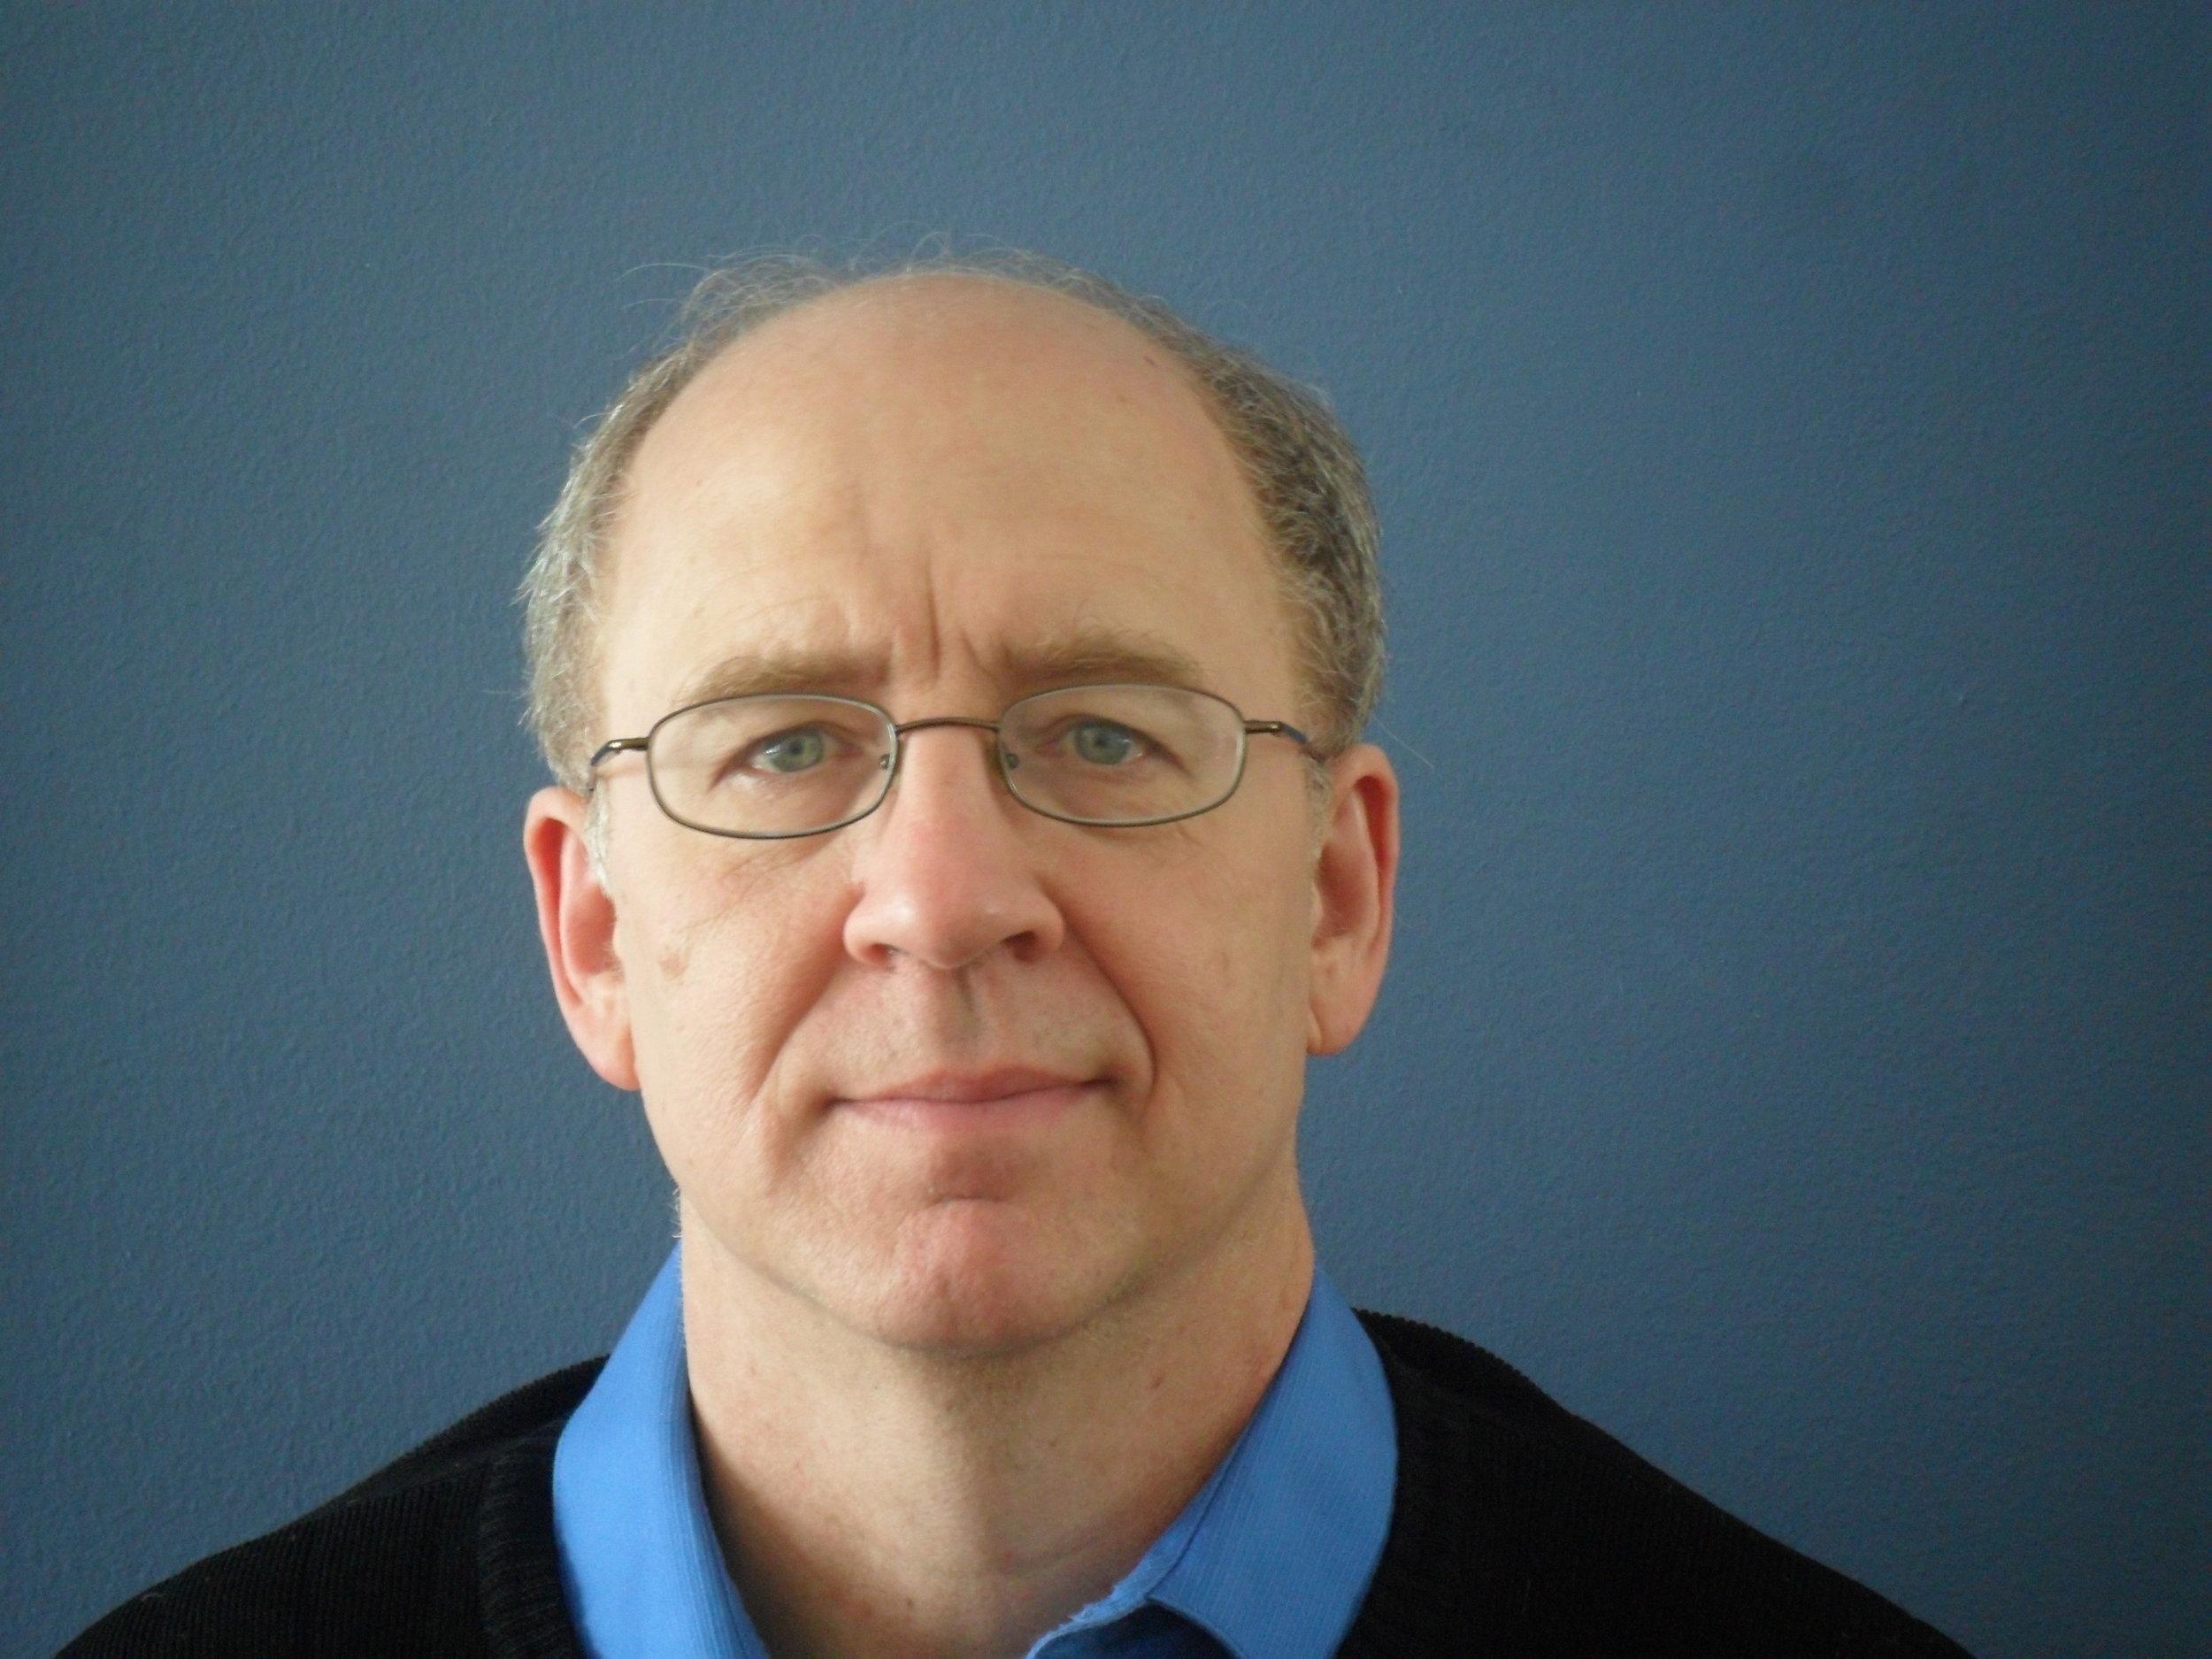 Professor Randal Picker